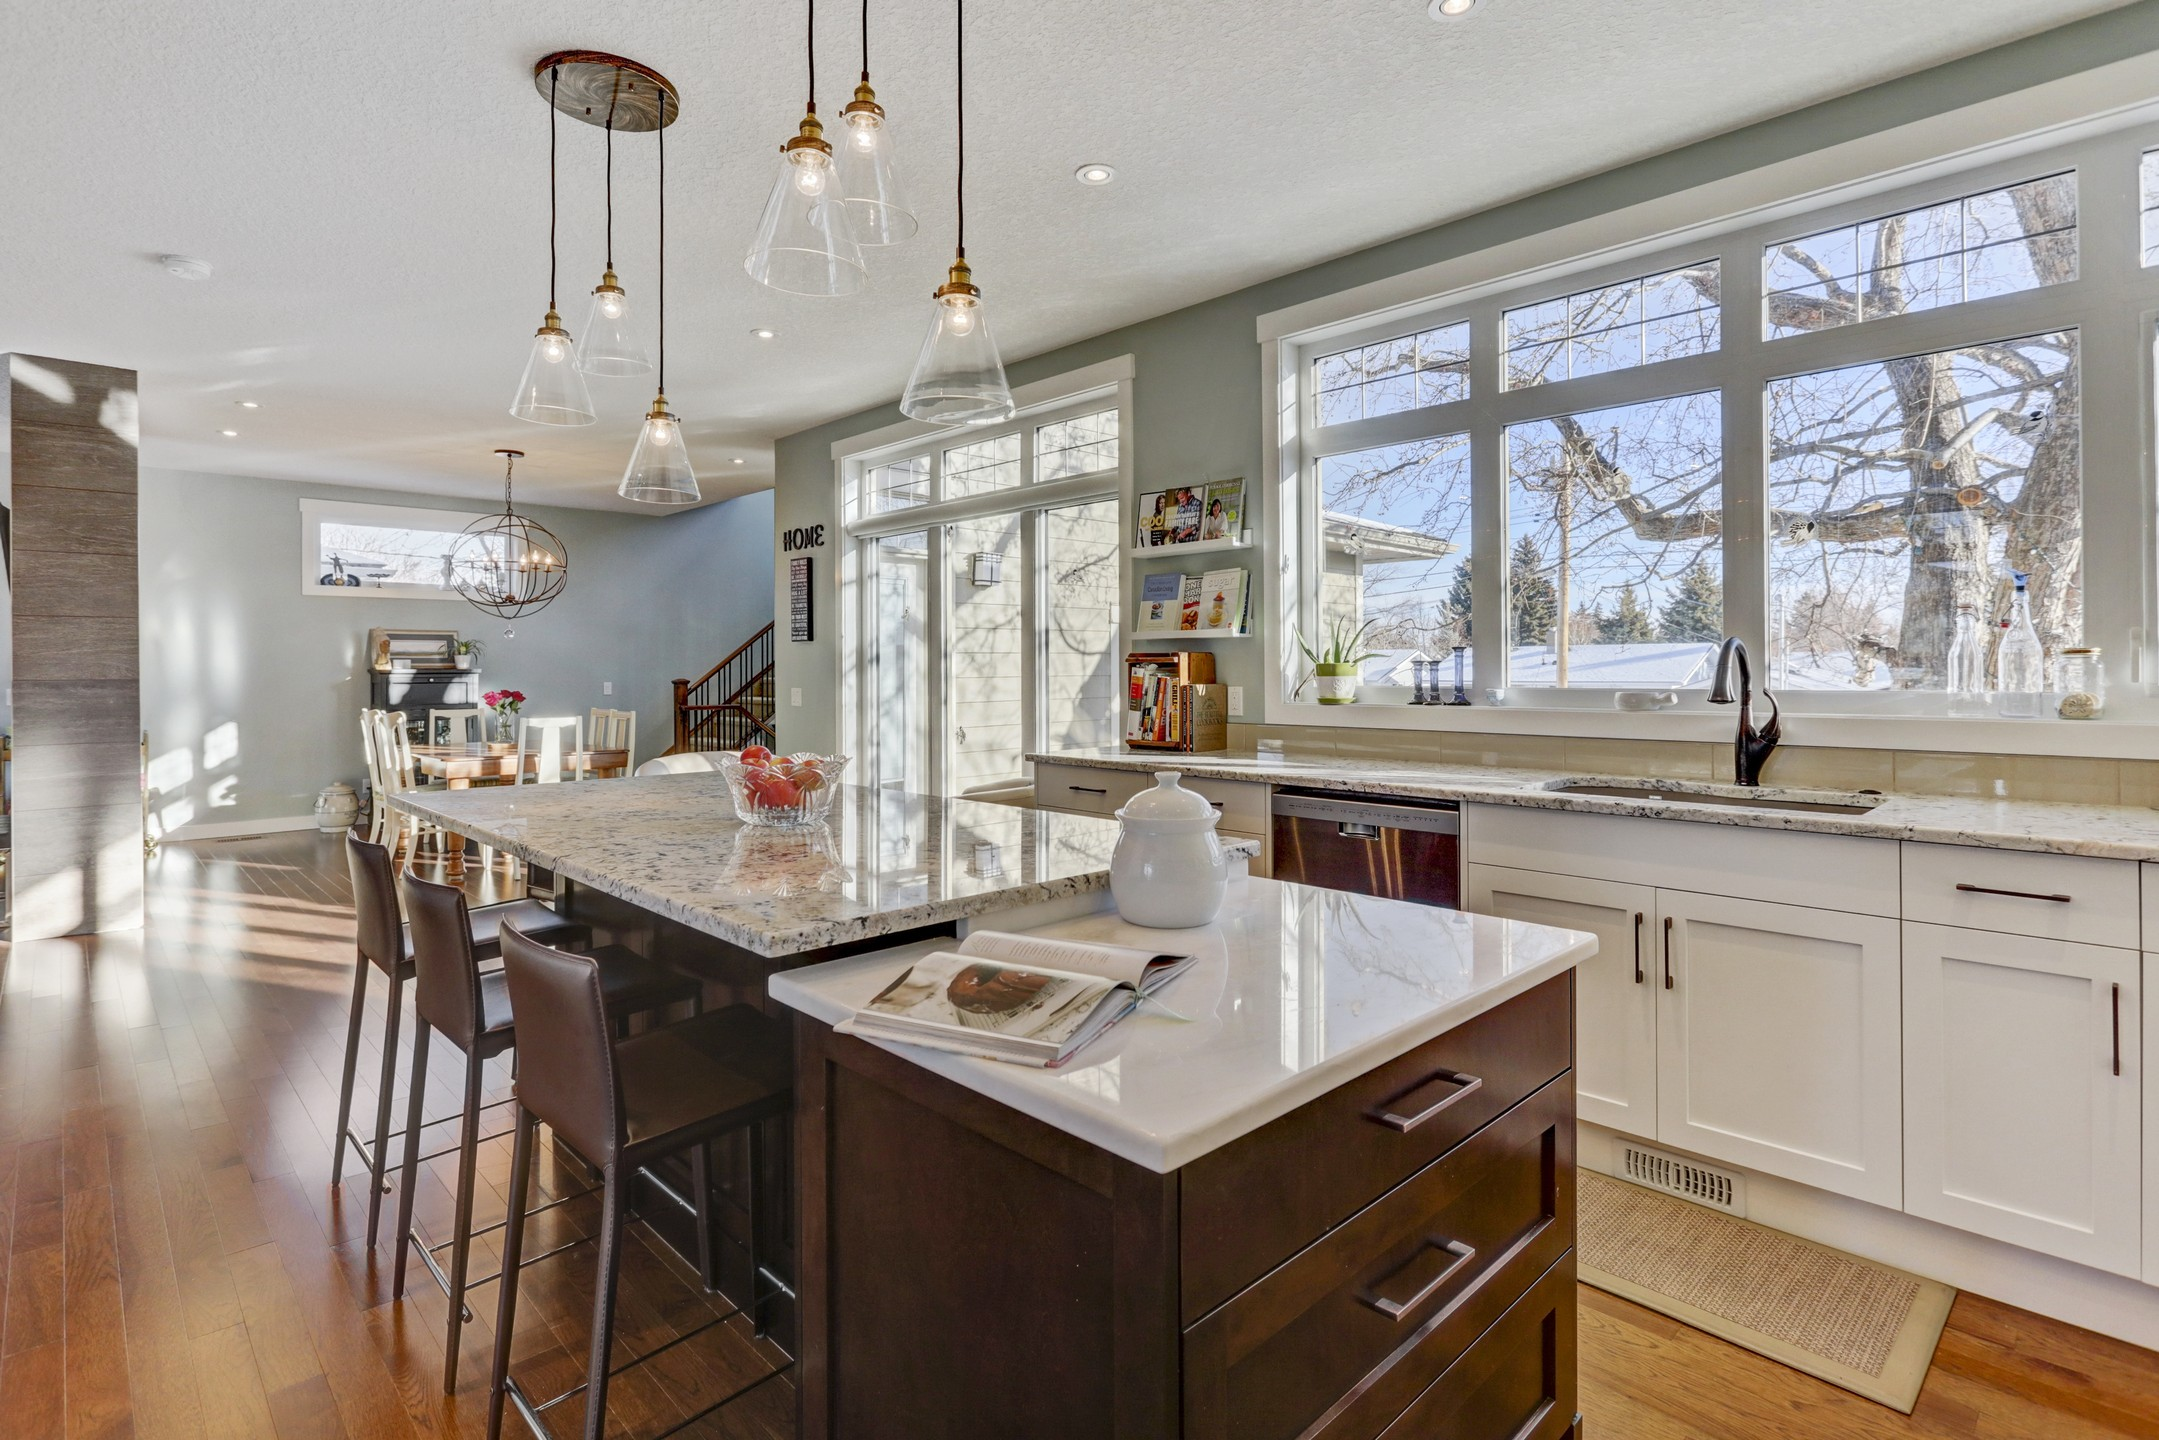 Glenbrook - Kitchen